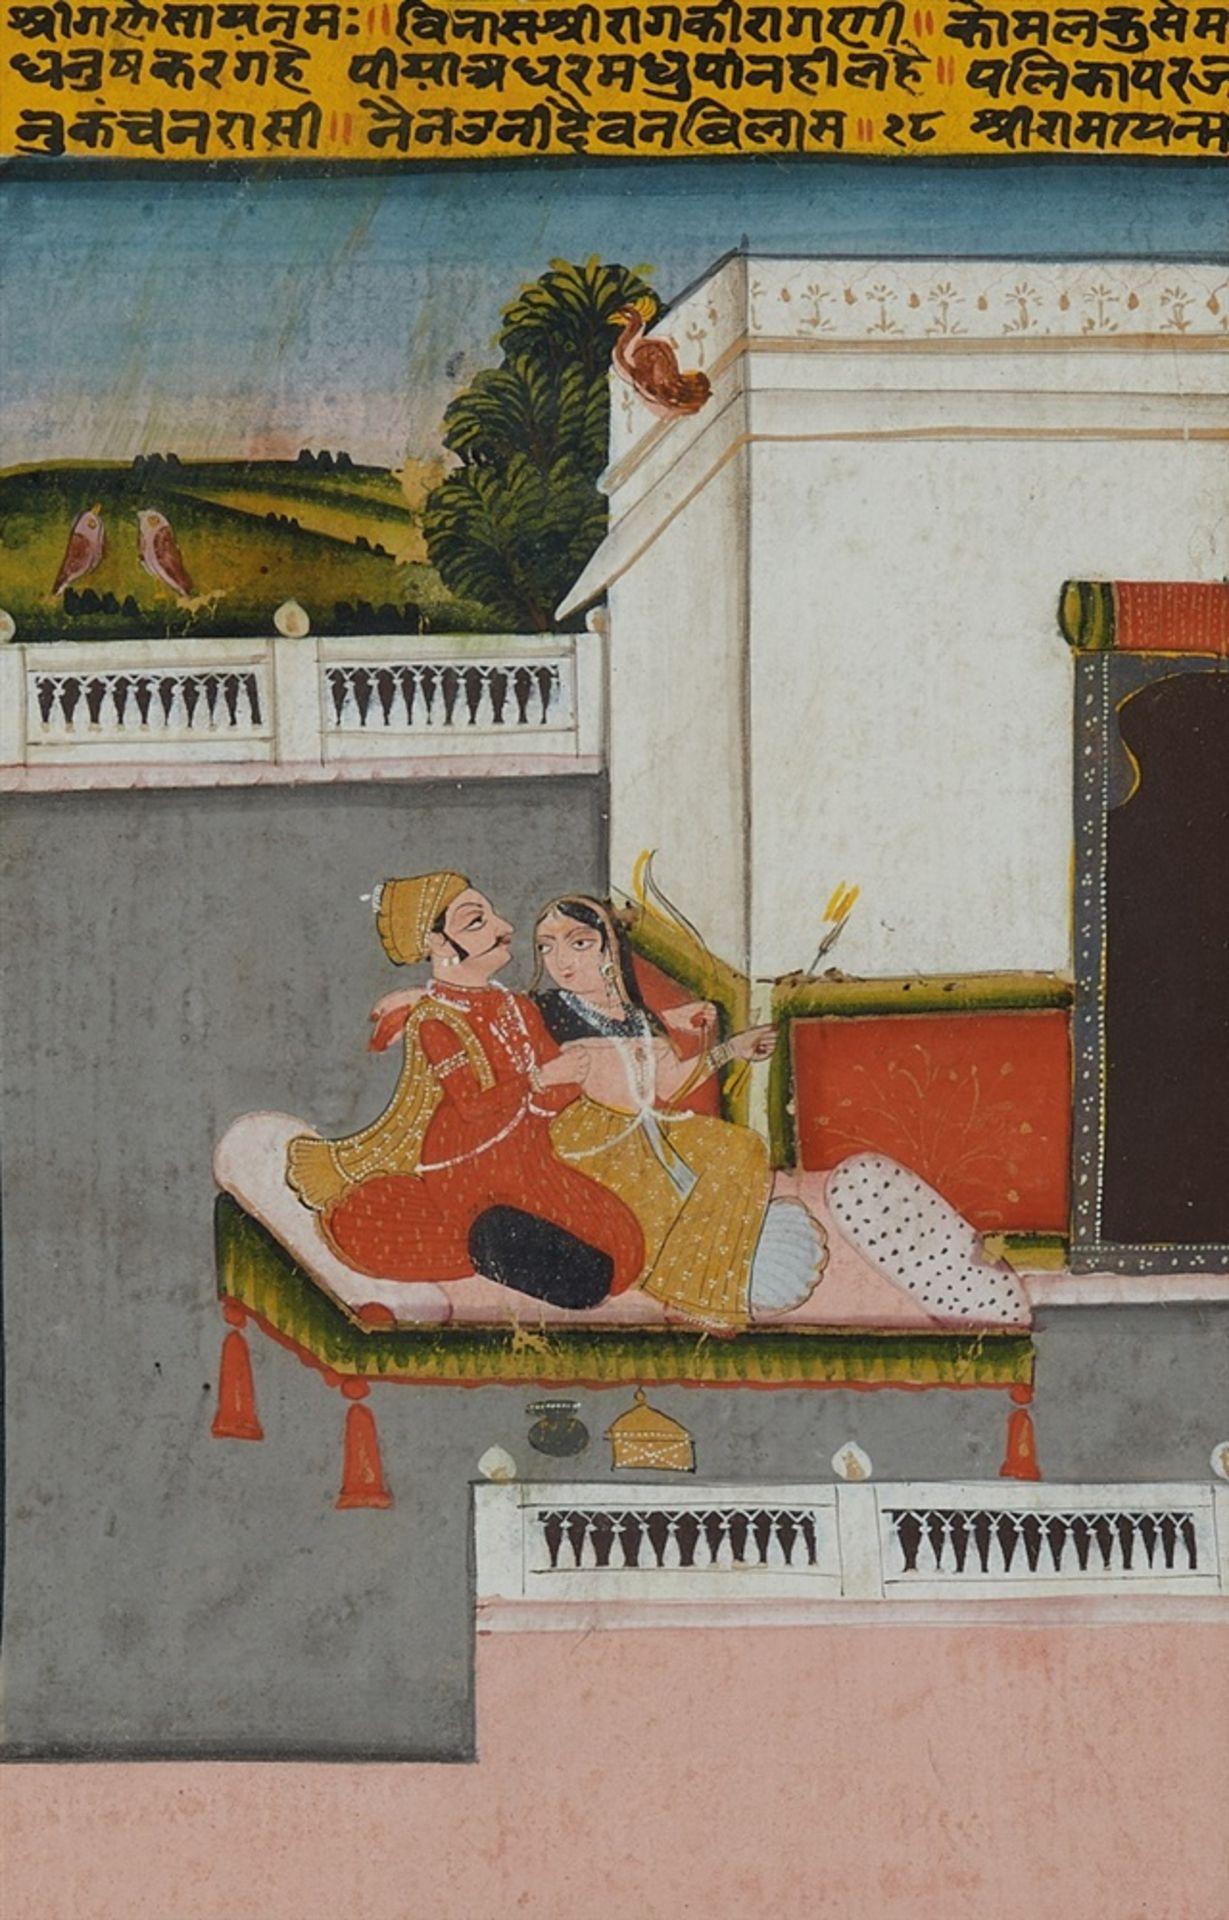 Anonyme Maler. Jaipur. Spätes 18./19. Jh. - Bild 2 aus 2